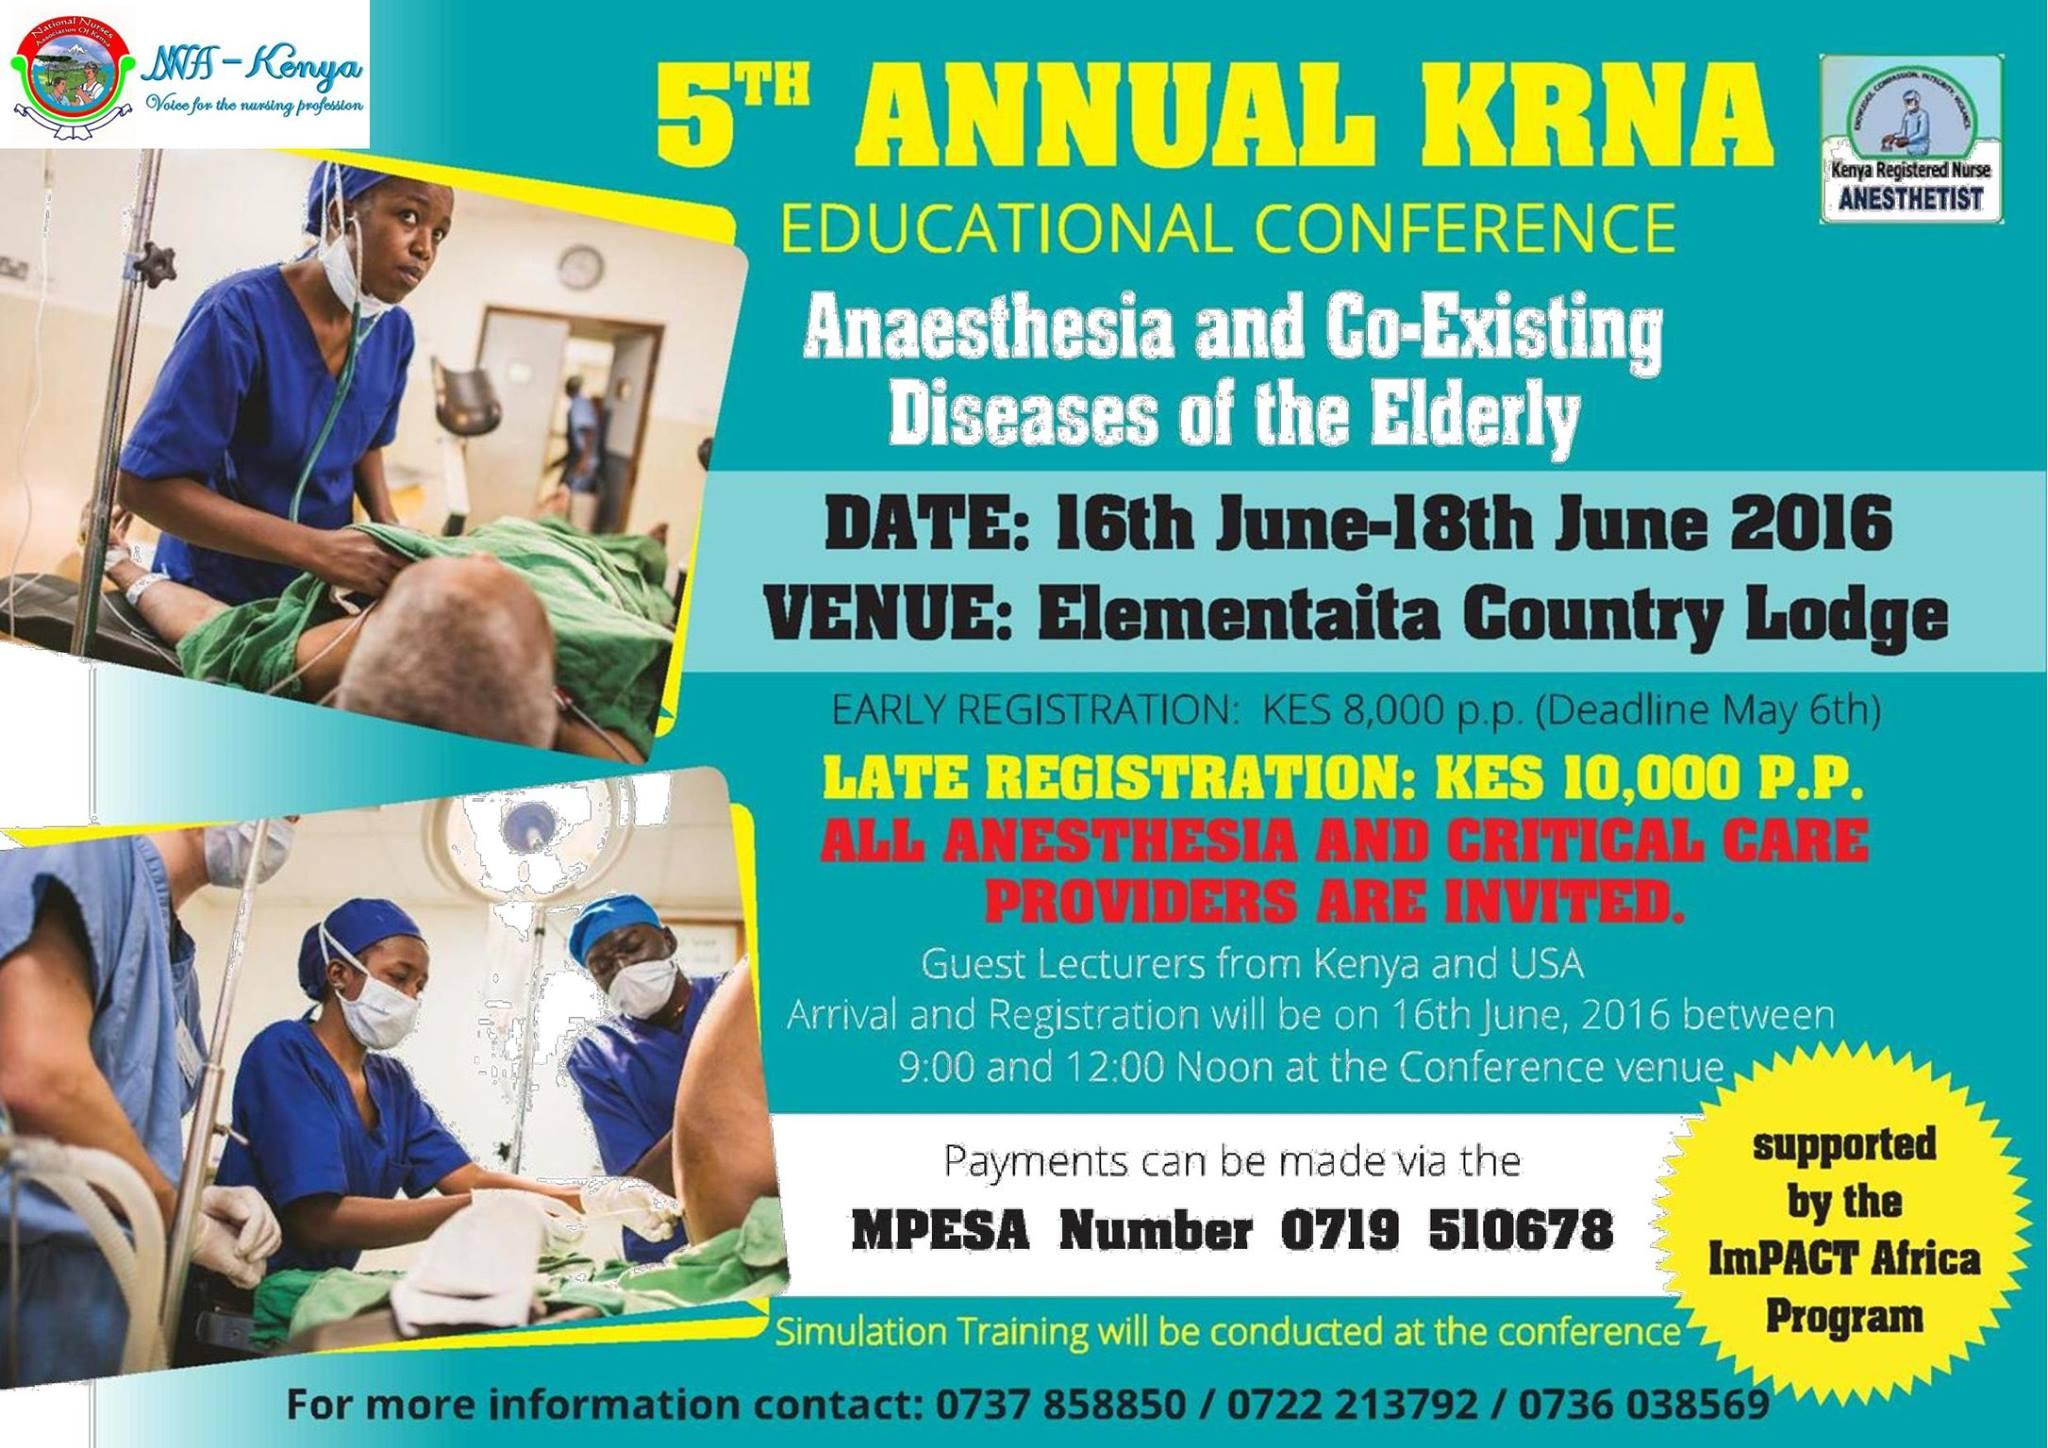 5th Annual KRNA